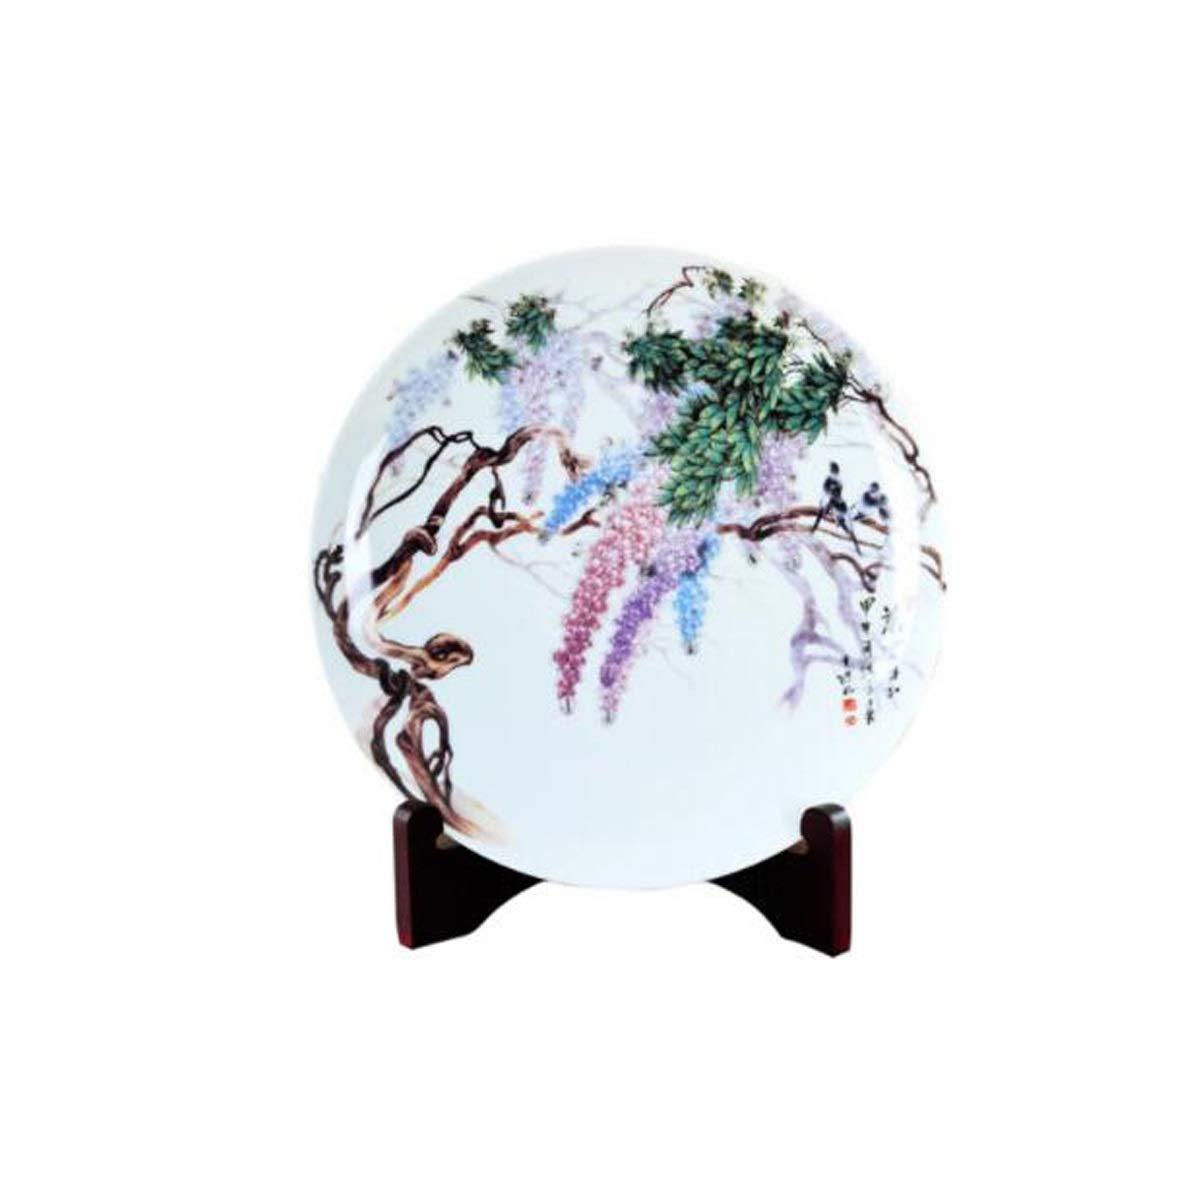 8HAOWENJU 花瓶の装飾、景徳鎮セラミックプレート、装飾的なプレート磁器の装飾品、工芸品、中国のリビングルームポーチ吊りプレート 中華風 (Color : Multi-colored) B07SVWSNWG Multi-colored